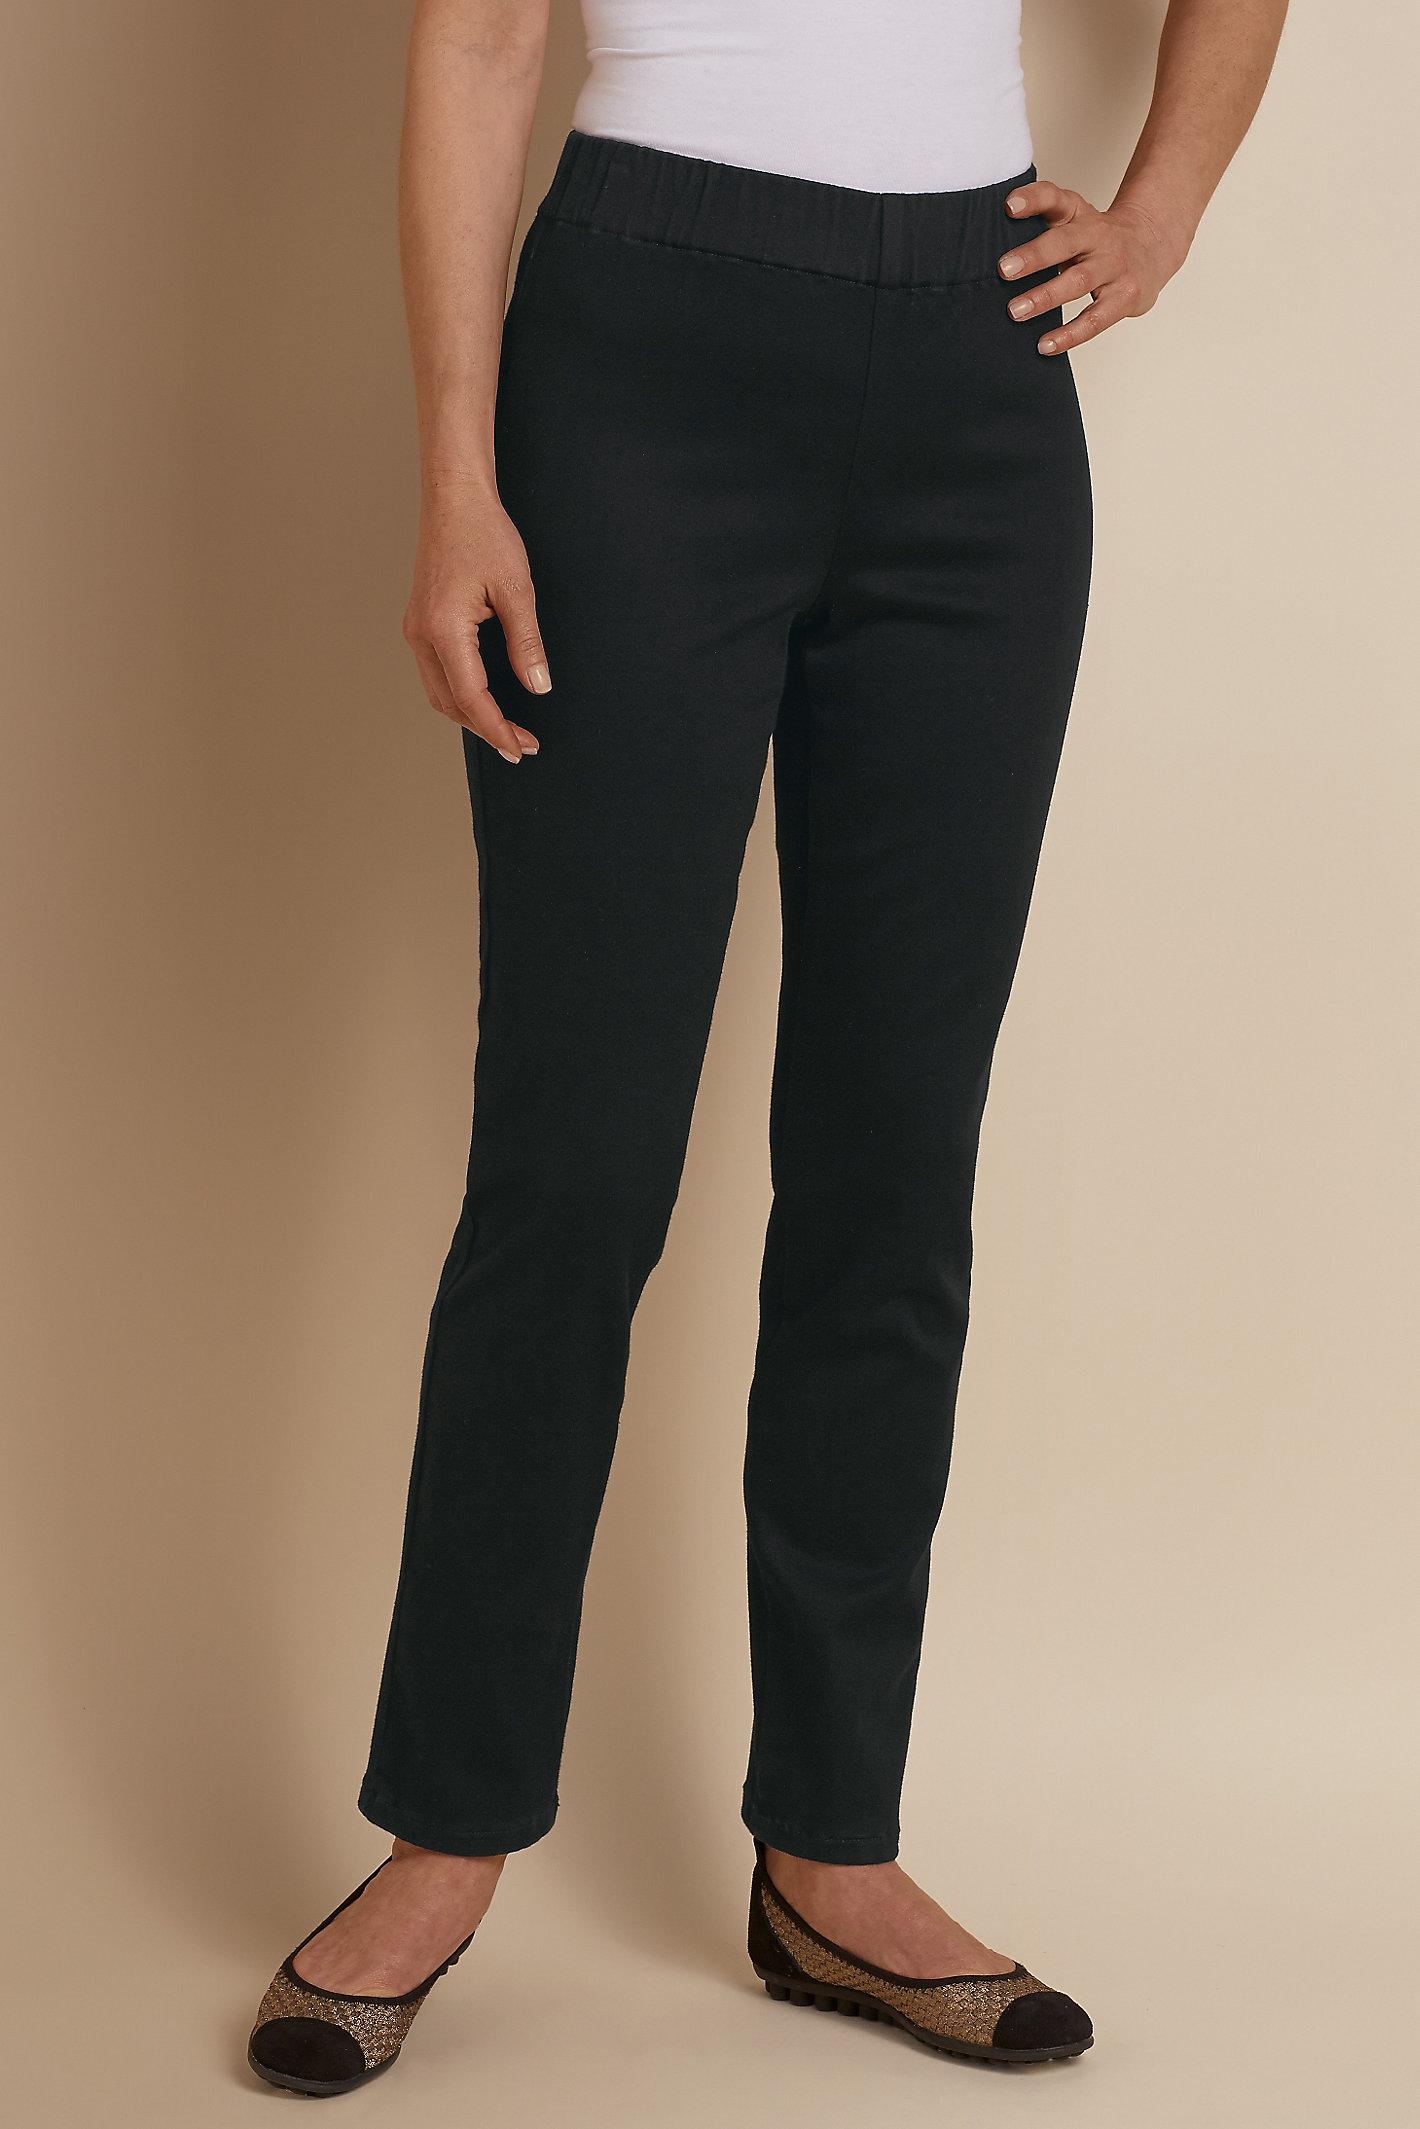 Tall The Amazing Black Pants